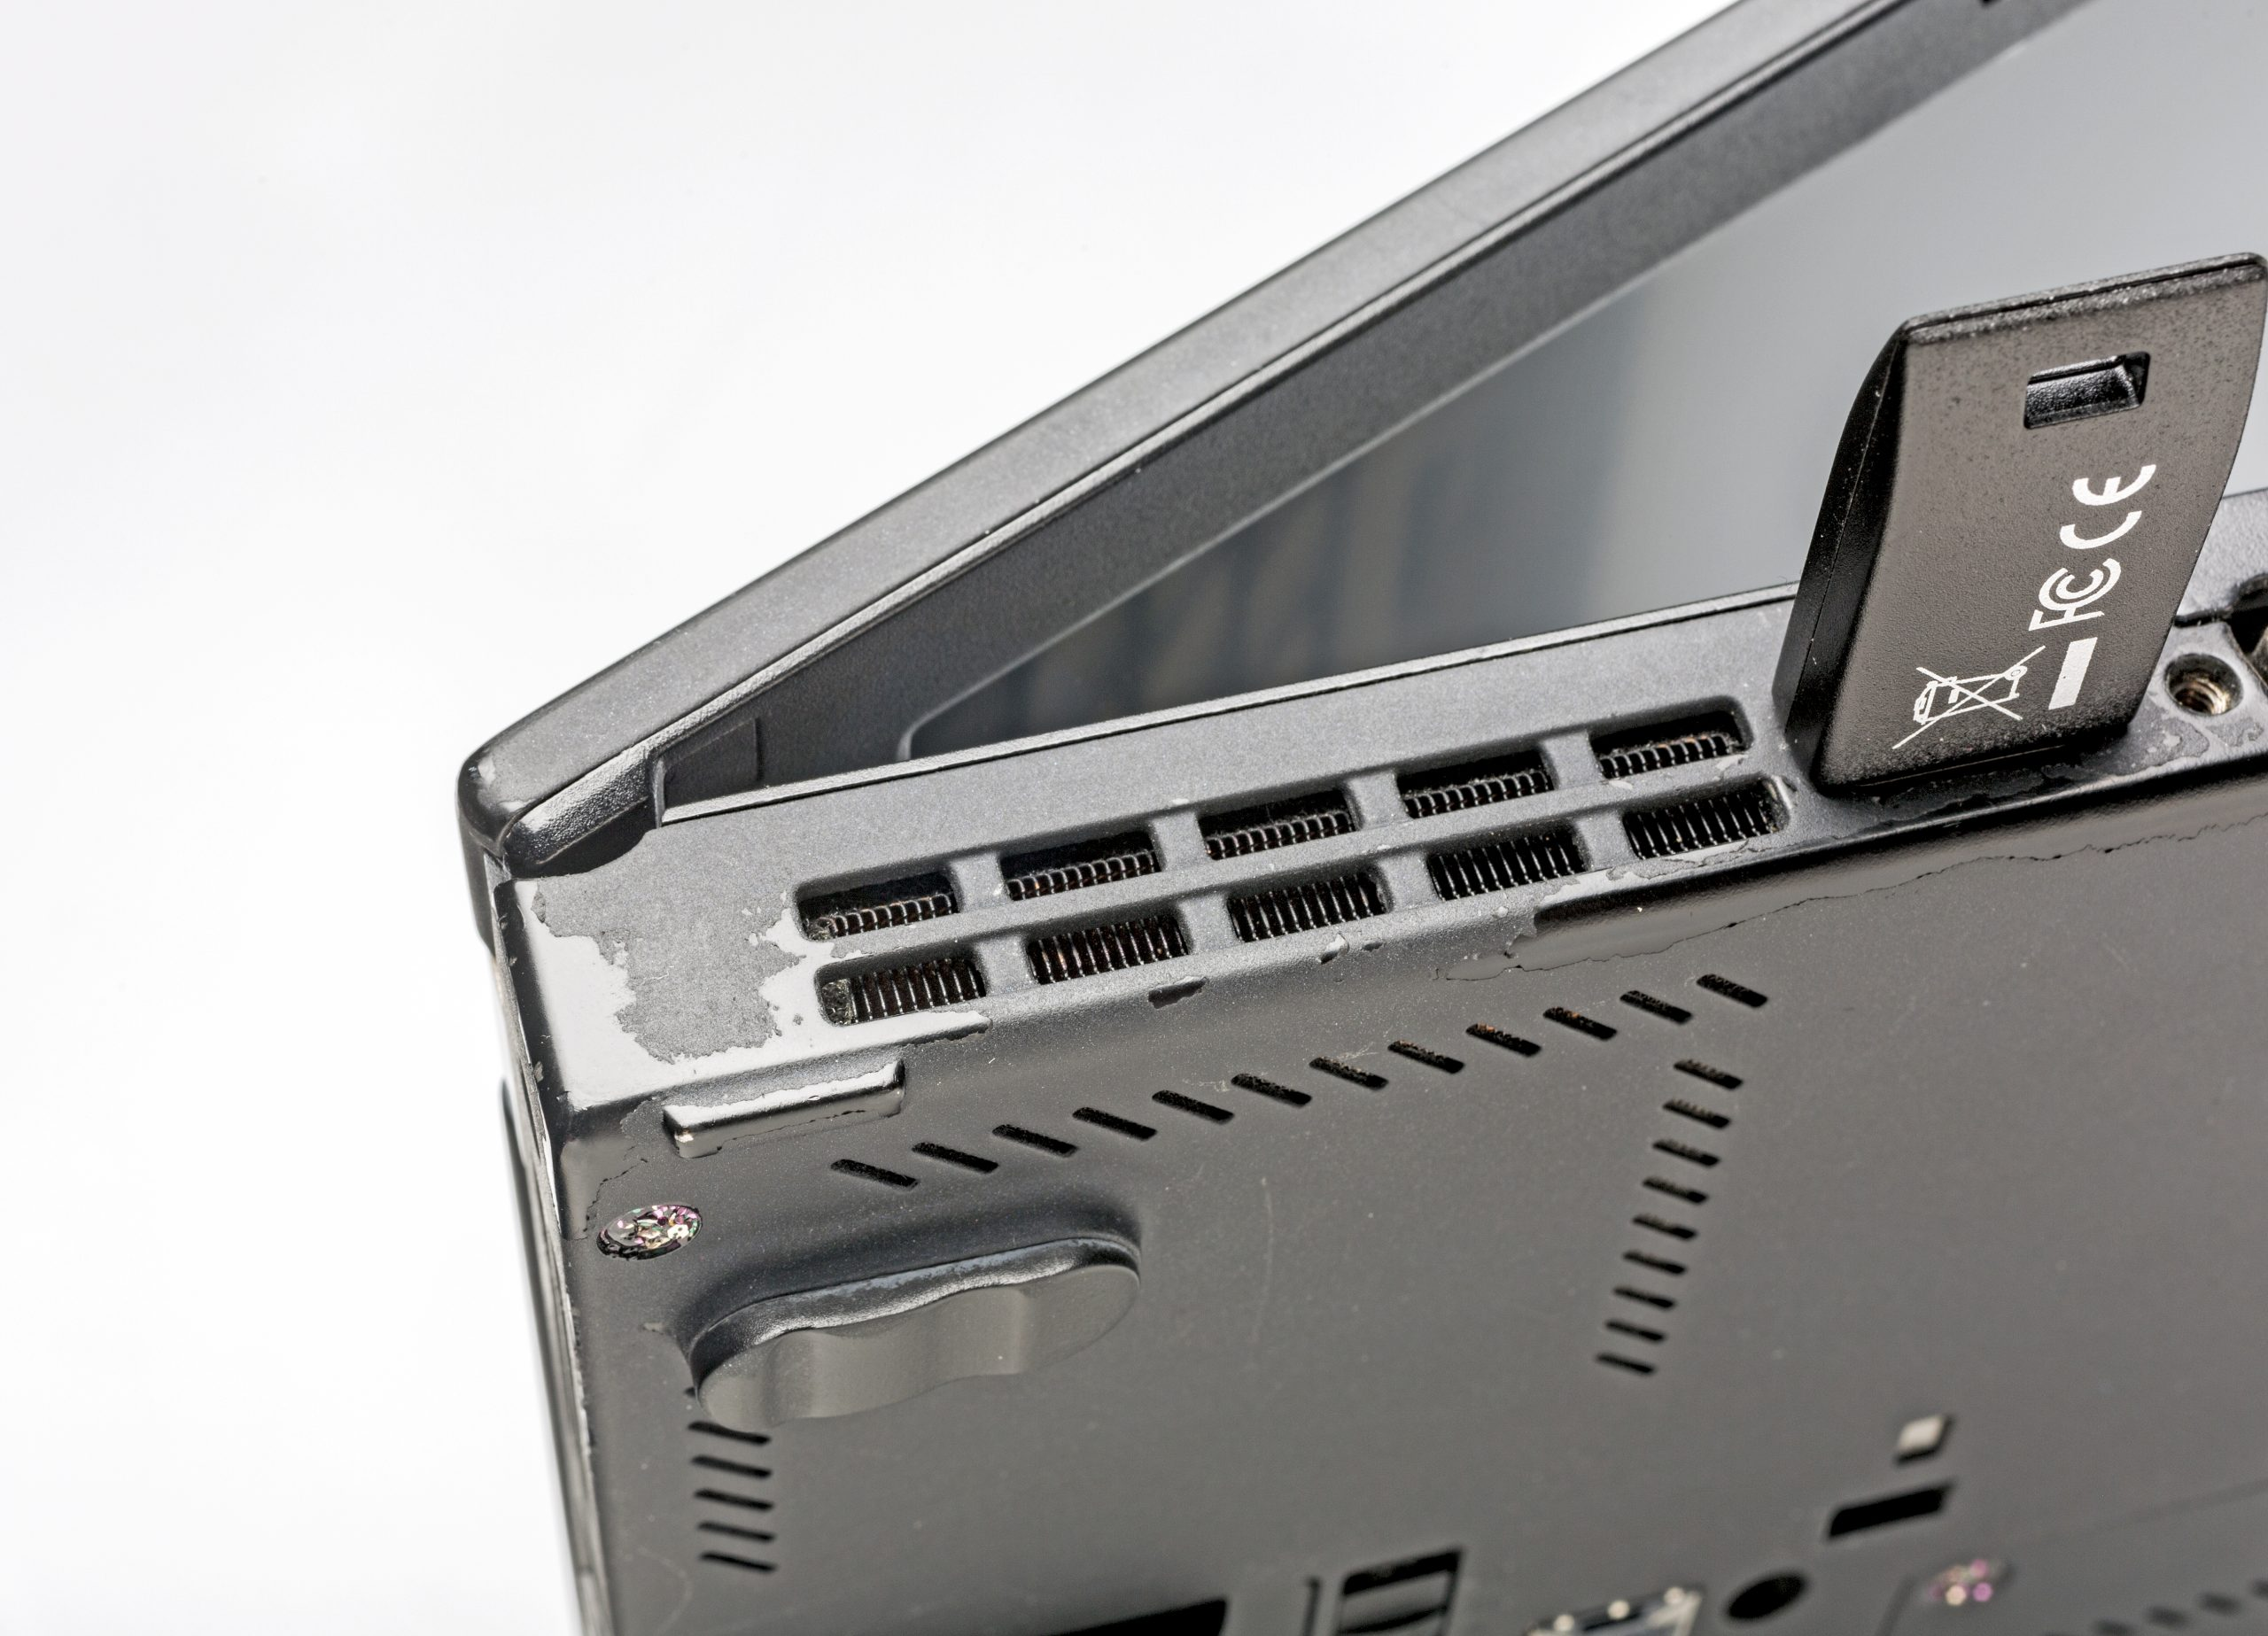 Nitrokey Nitropad gebruikte ThinkPad gebruikssporen